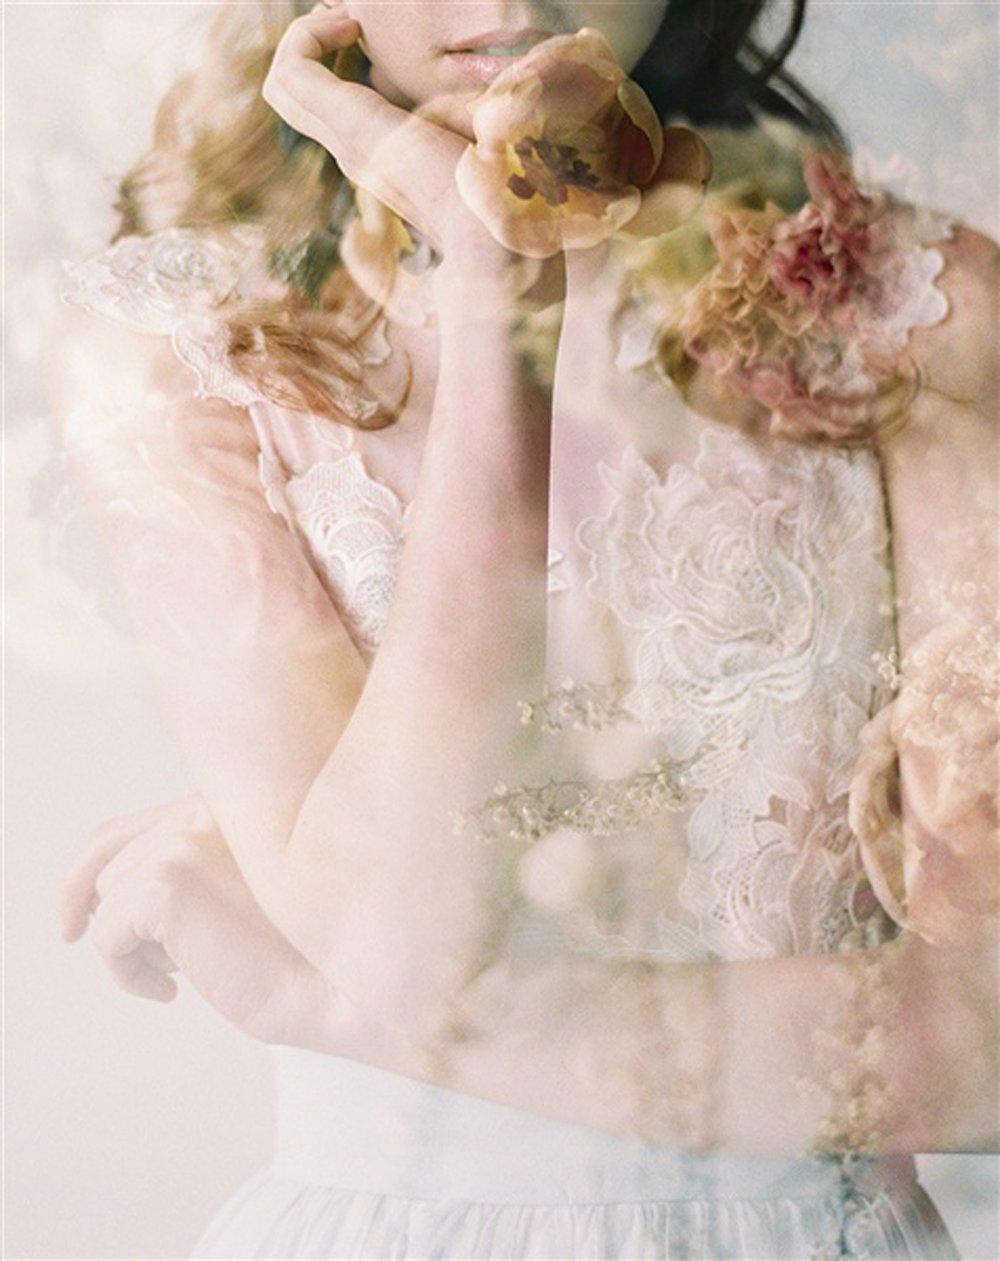 Sentient Floral-Carrie King Photographer-065_denver-photo-collective-photogrphy-natural-light-studio.jpg